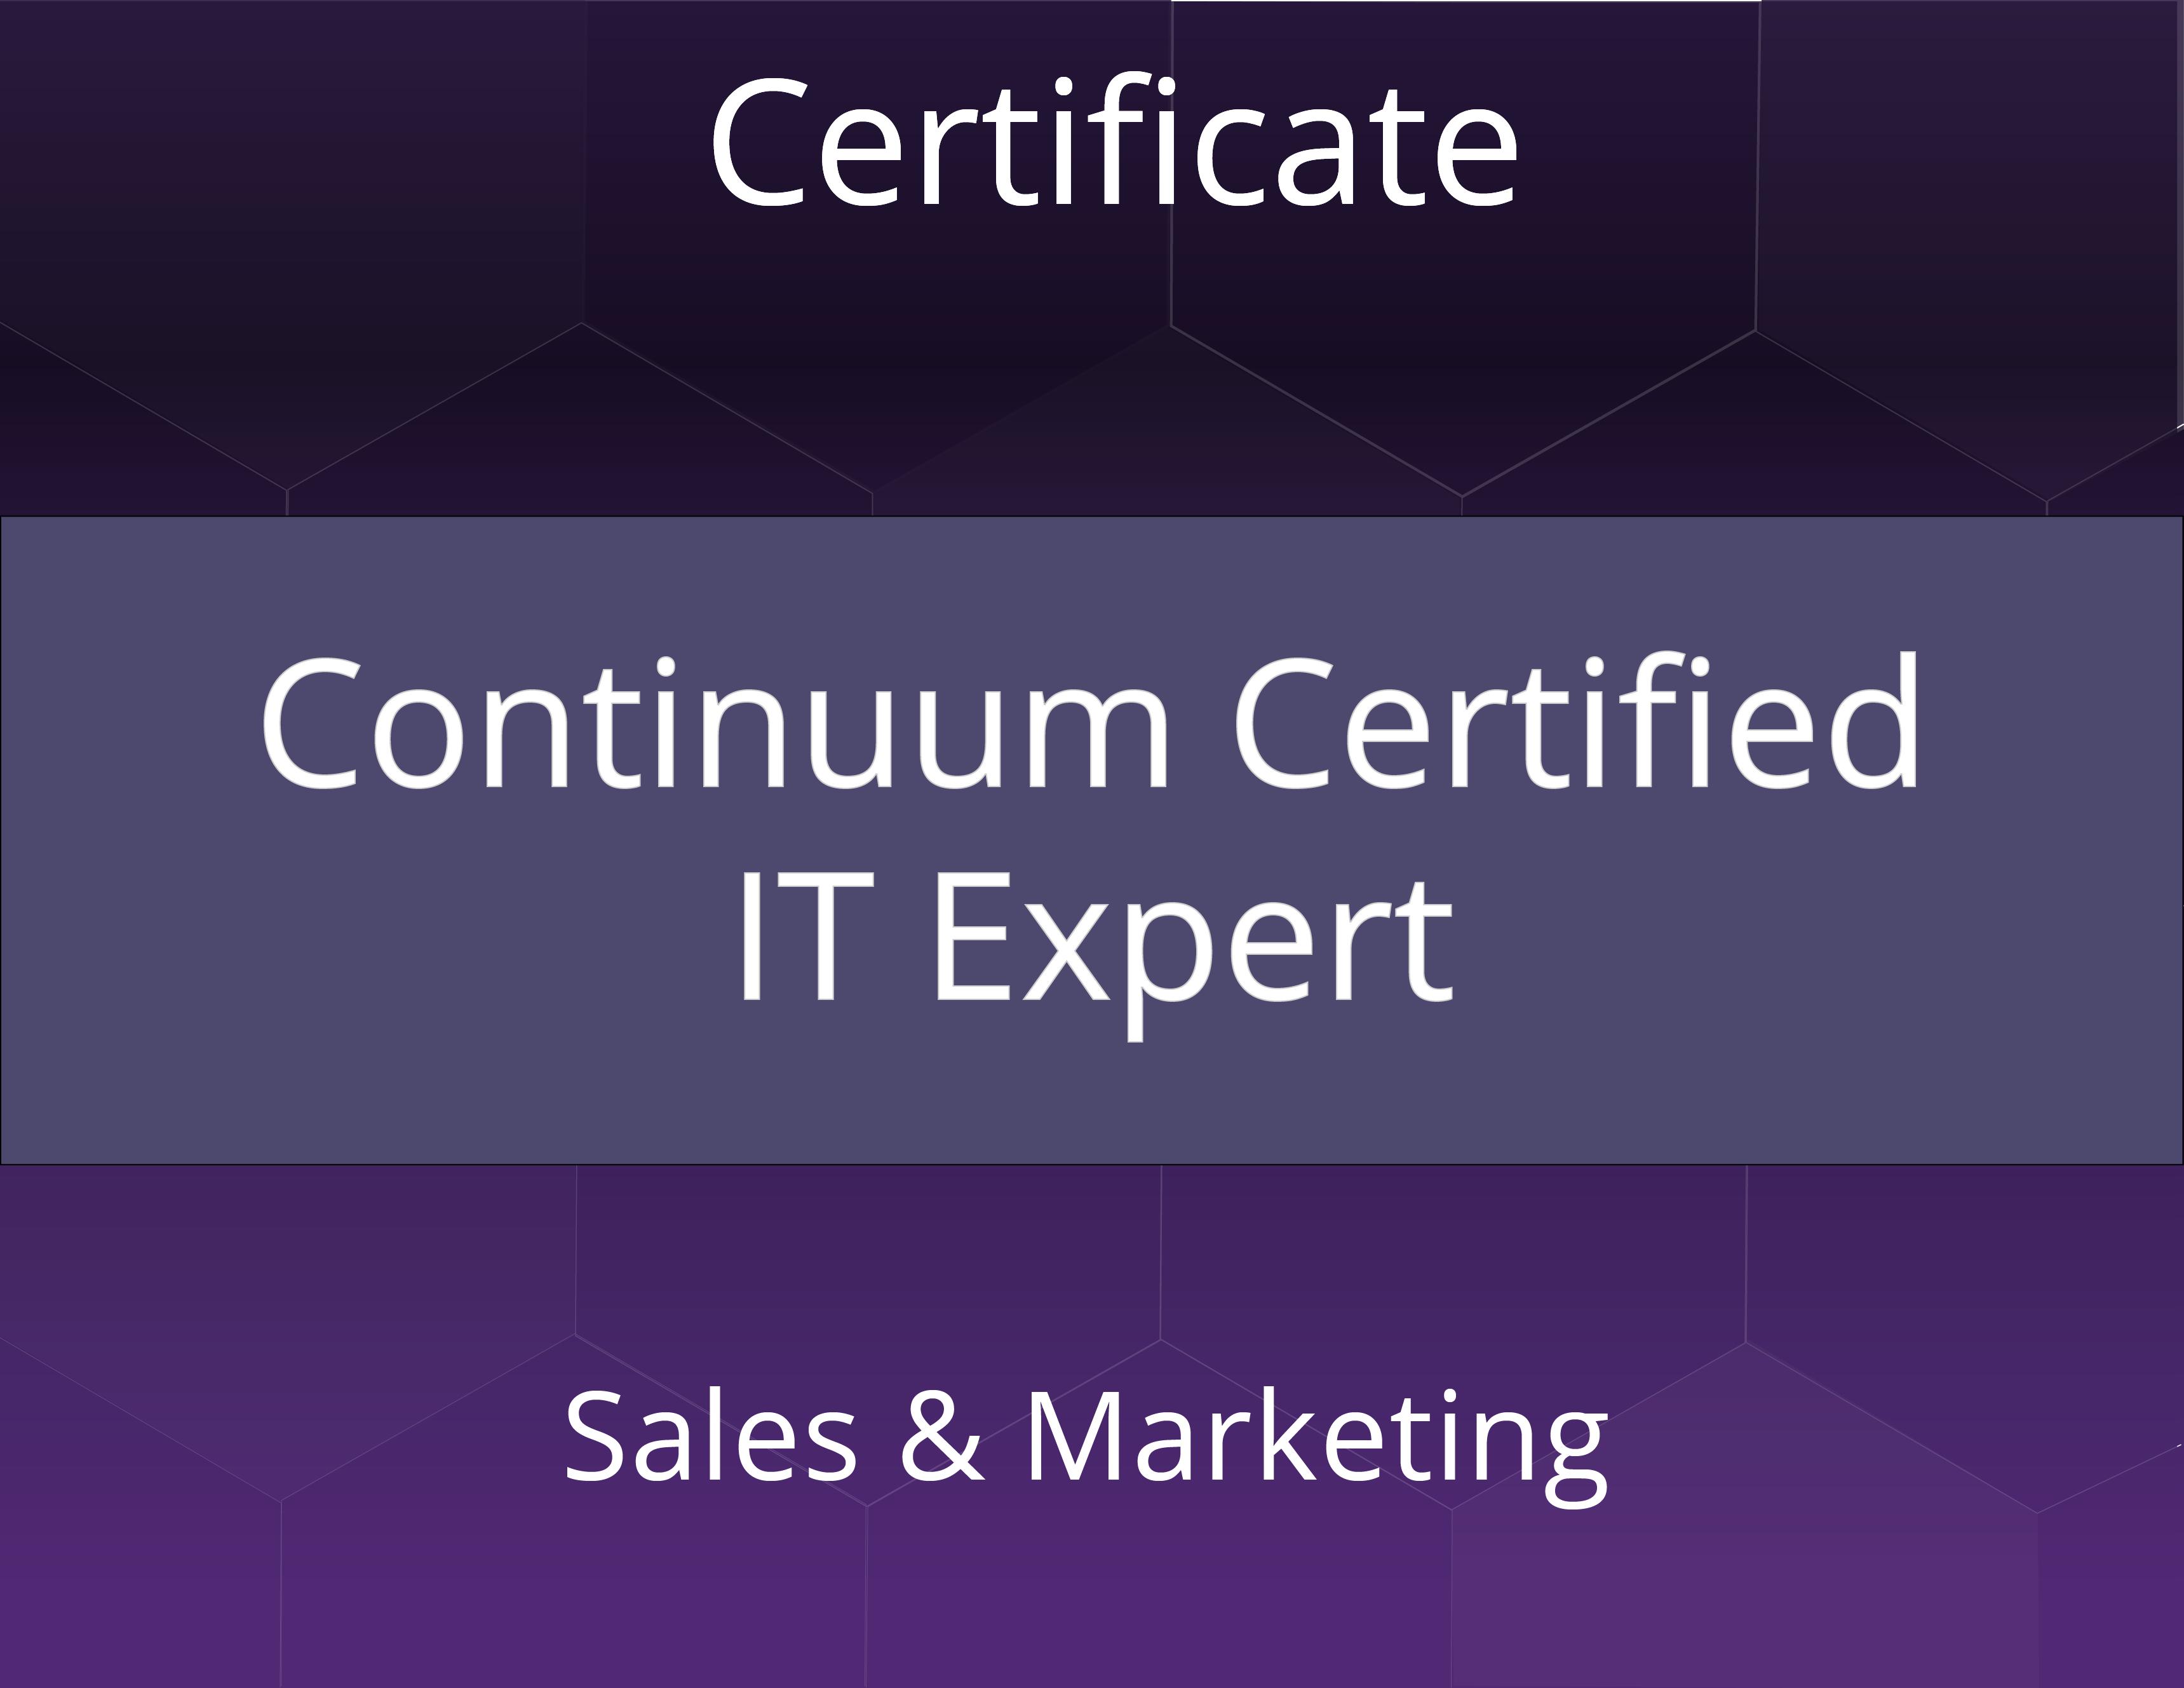 Continuum Certified IT Expert